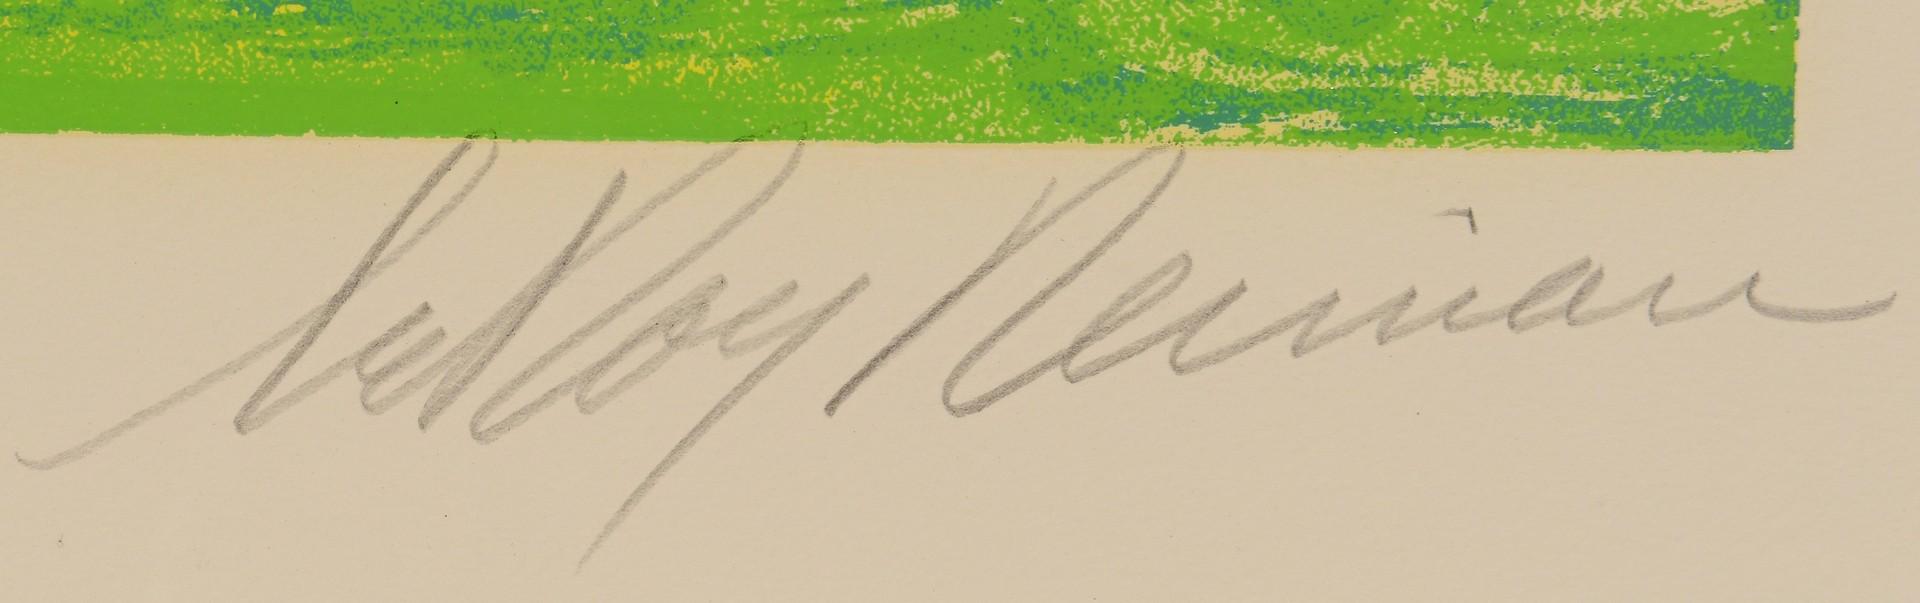 Lot 436: LeRoy Neiman Serigraph, Olympics Opening Ceremony